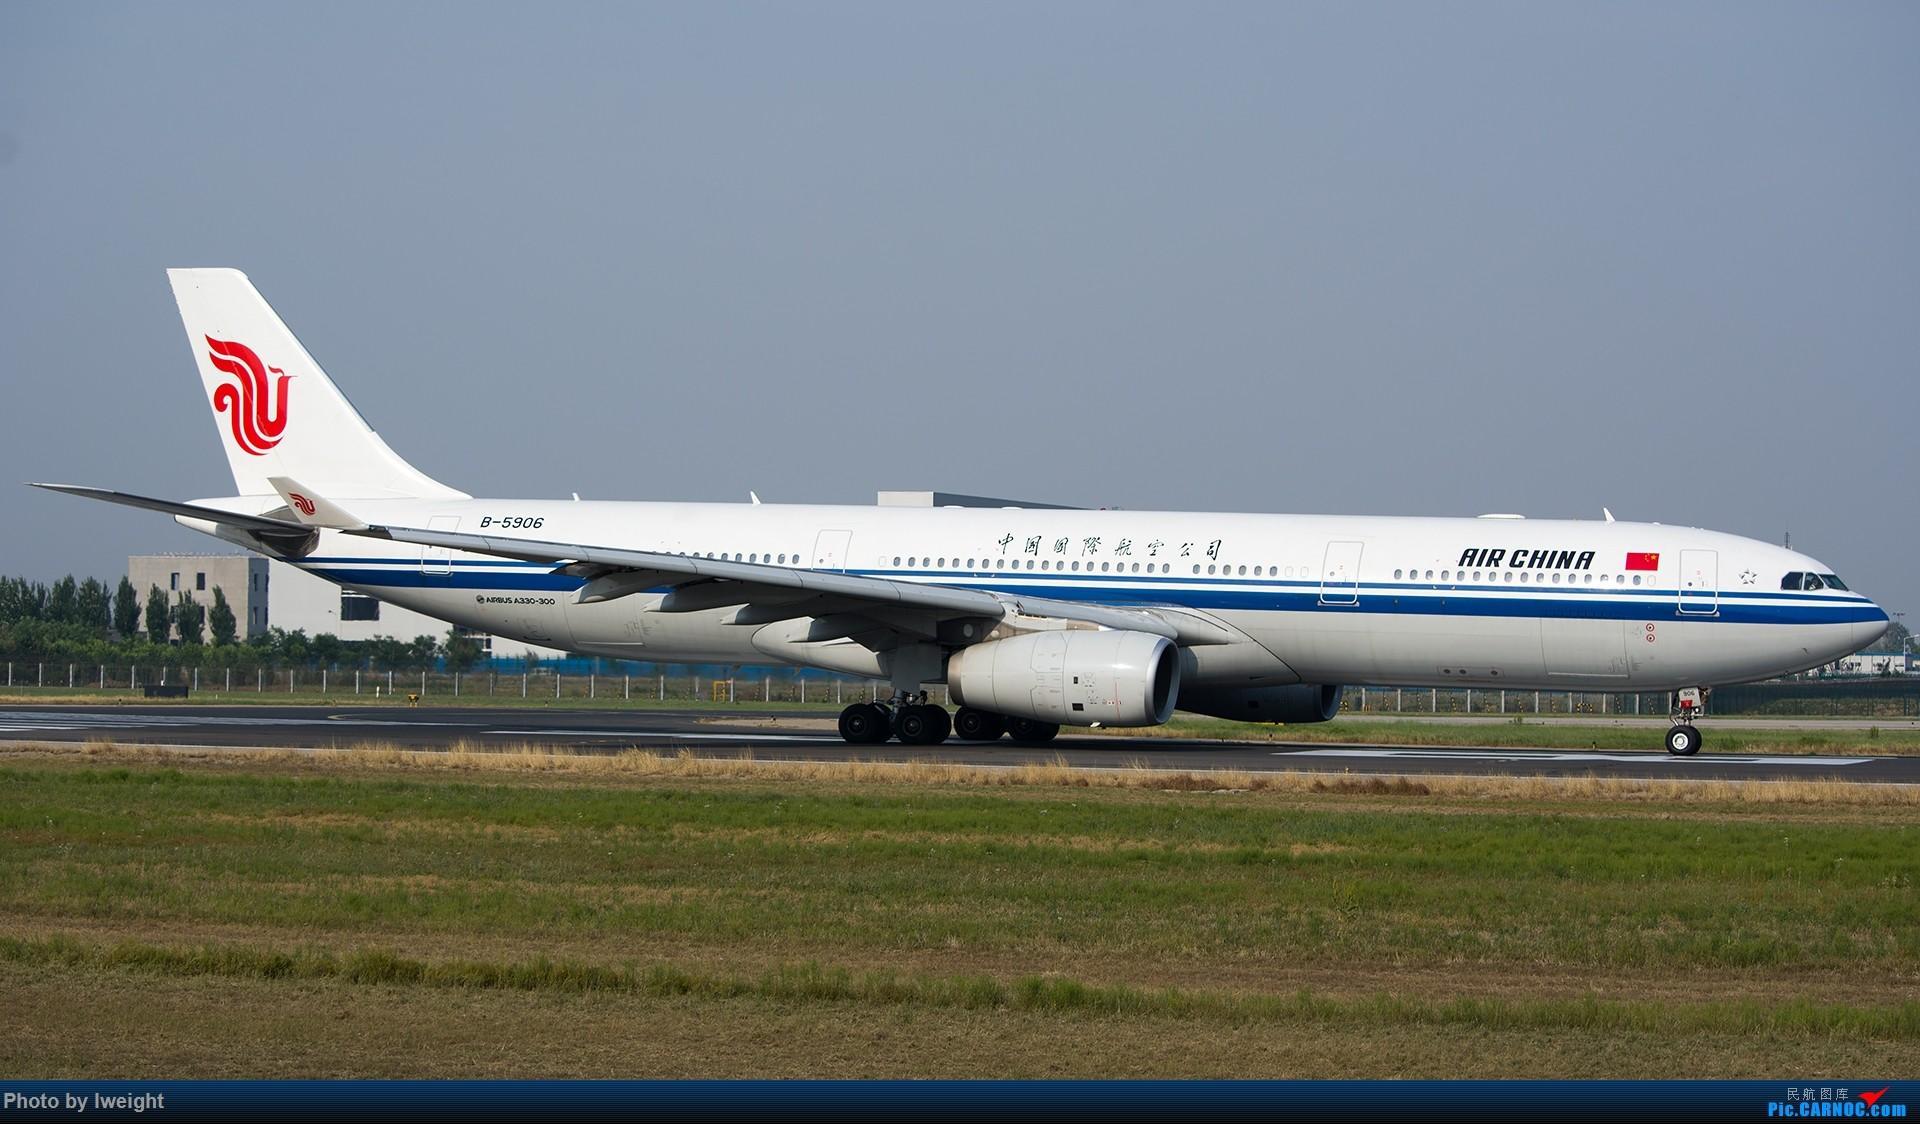 Re:[原创]周末帝都霾天拍机,凑合看看吧【2015-5-23】 AIRBUS A330-300 B-5906 中国北京首都国际机场